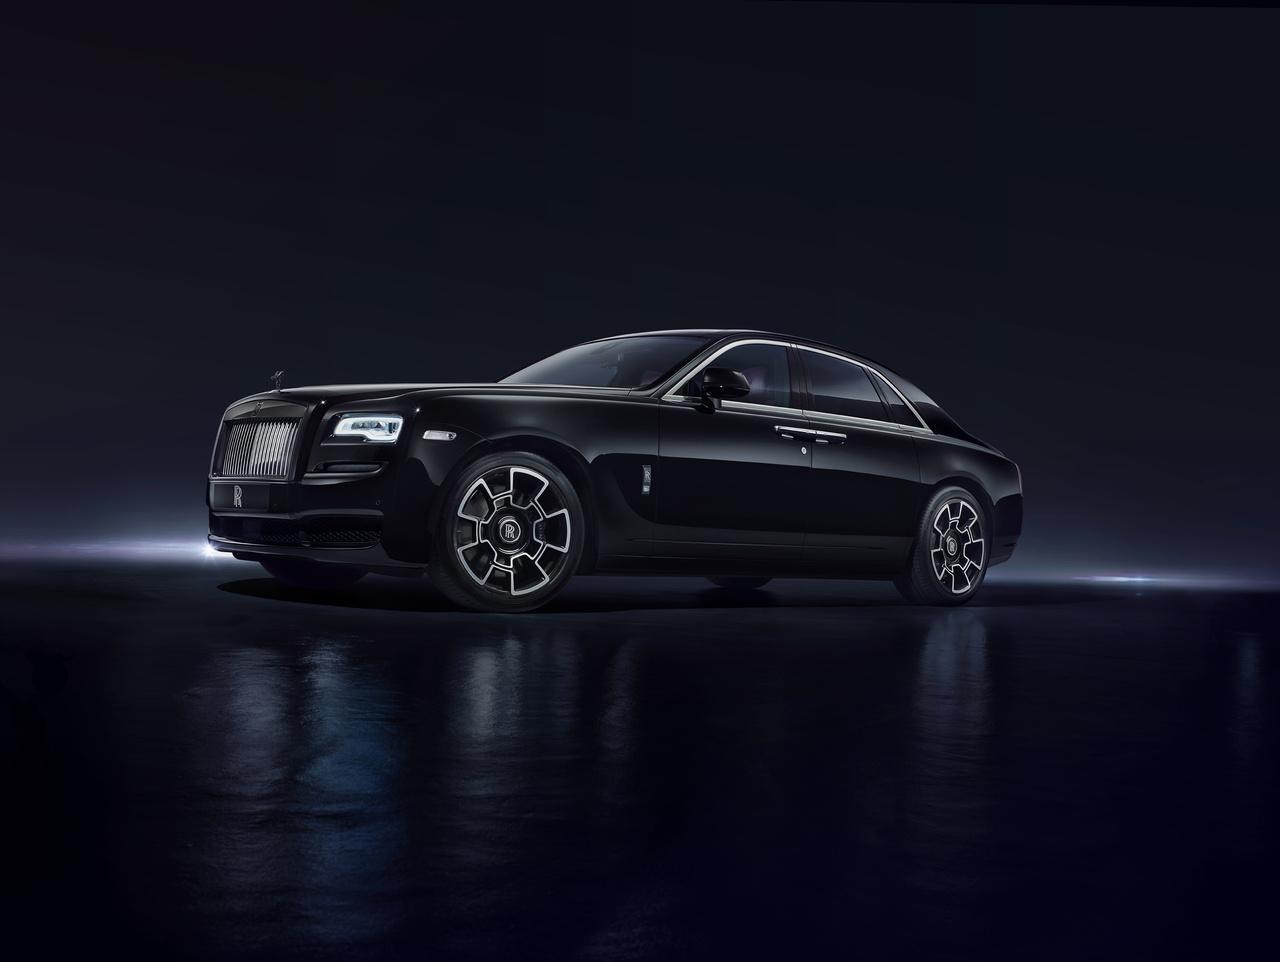 Rolls Royce black badge schwarz